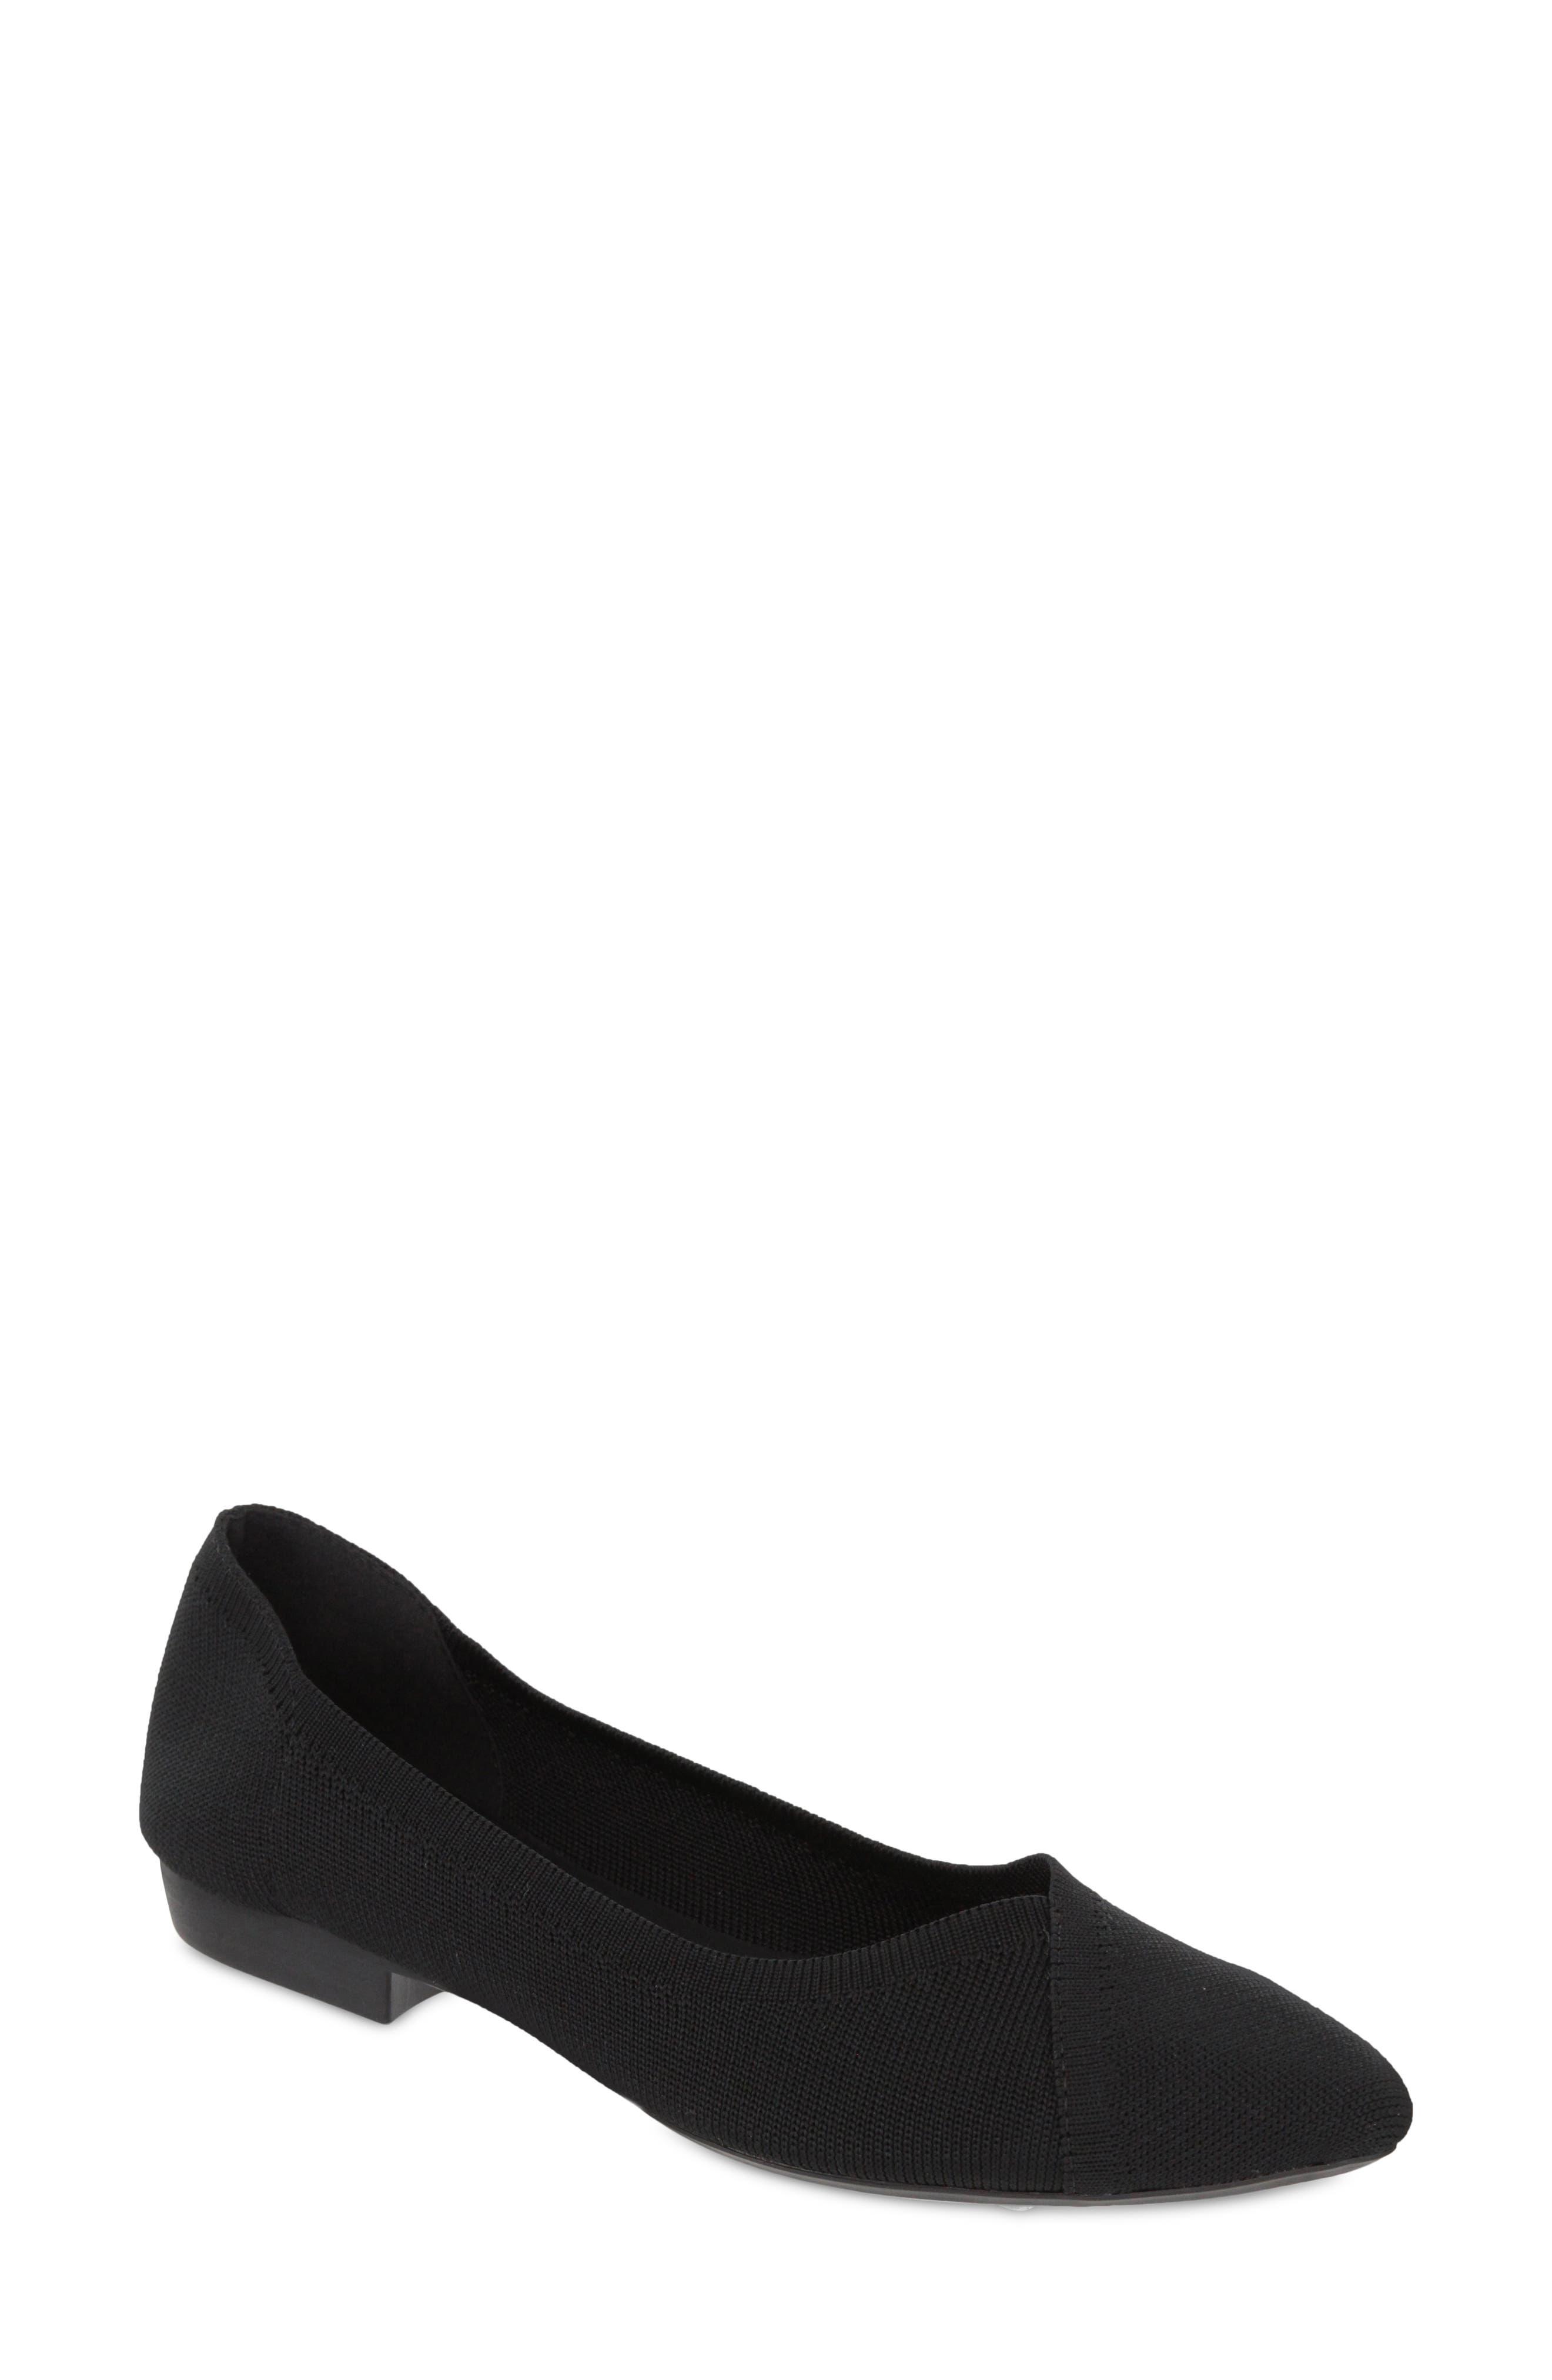 Jennette Pointed Toe Flat